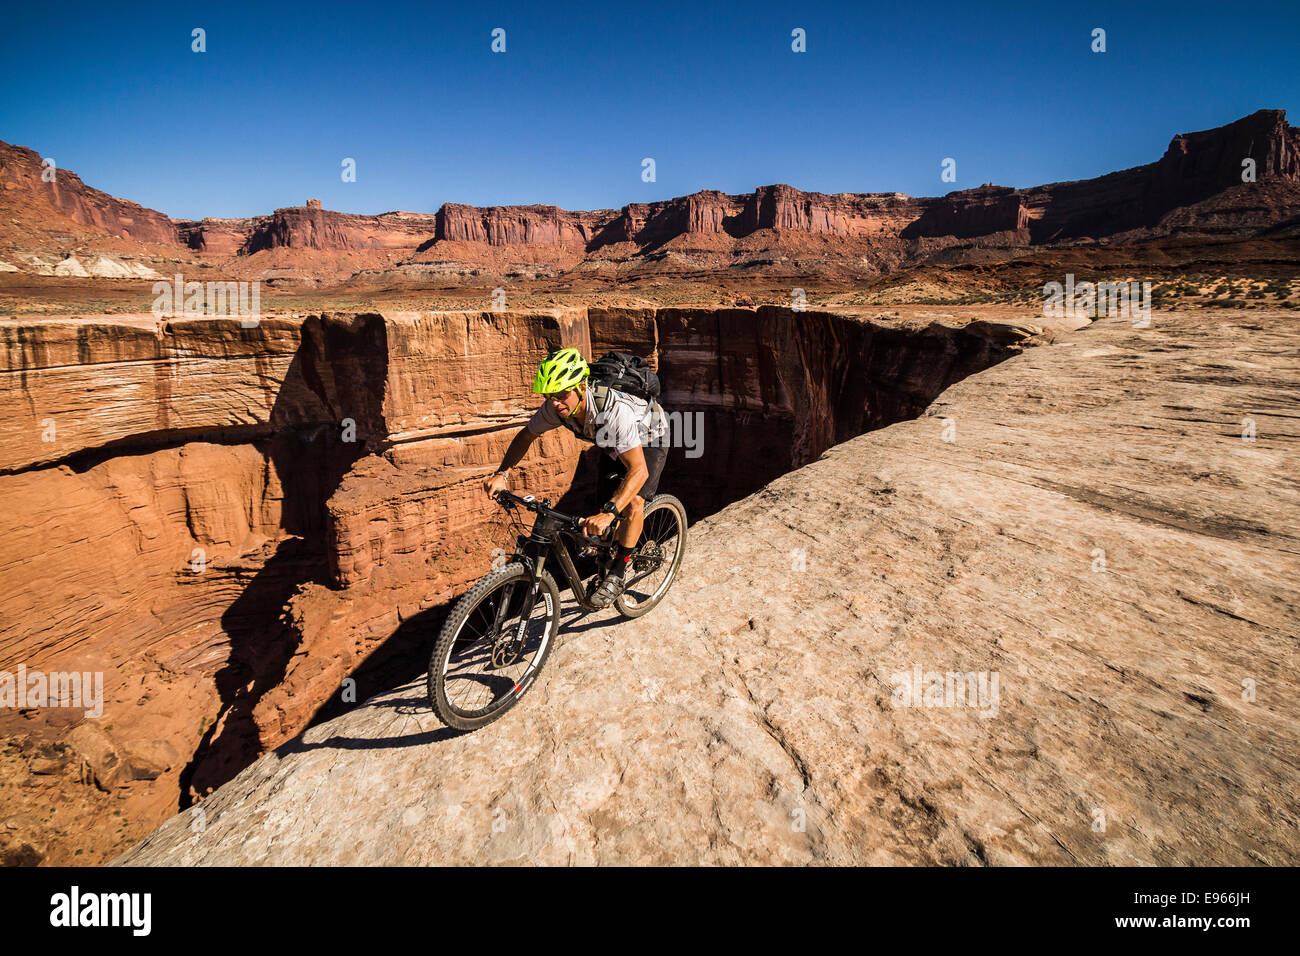 Wes Shirey mountain biking on the White Rim trail, Canyonlands National Park, Moab, Utah. Stock Photo